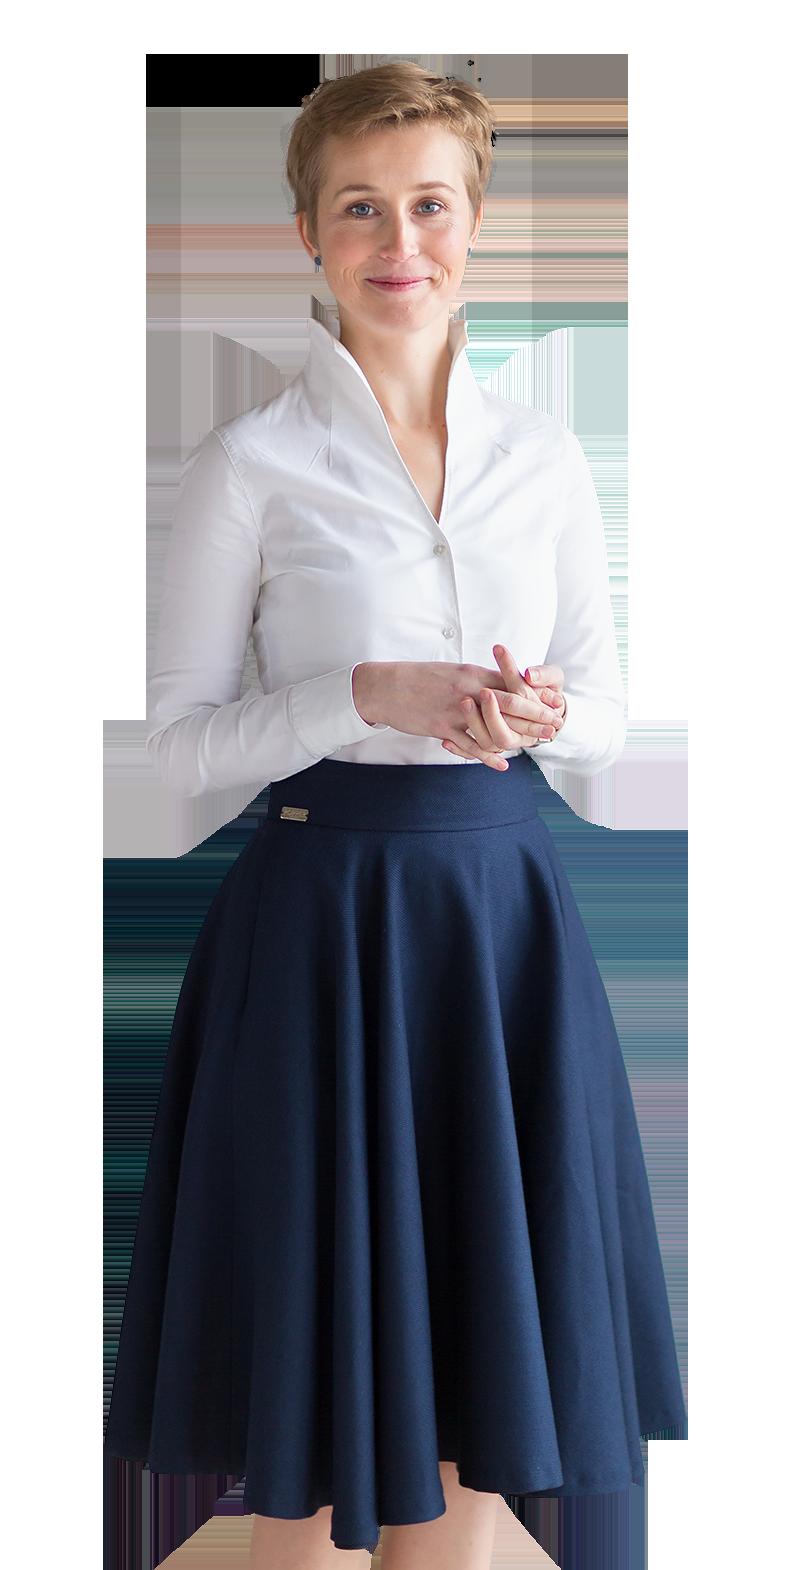 Markéta Hrbáčková